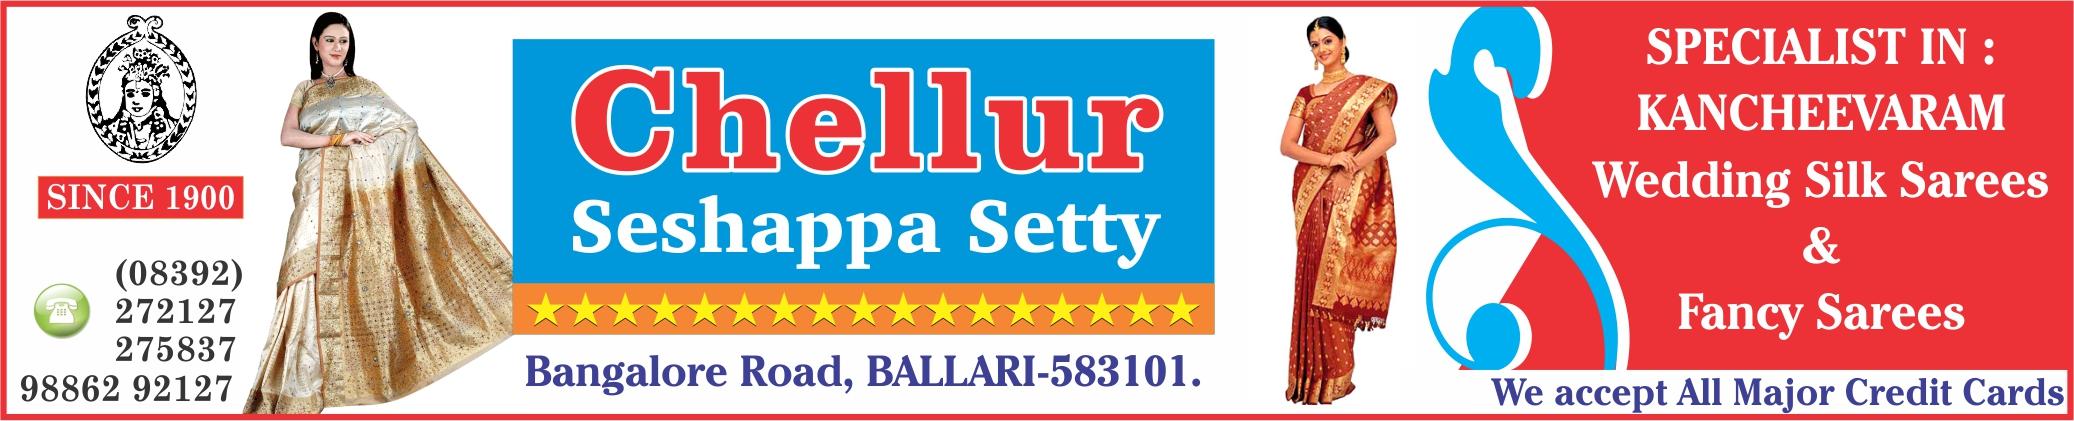 Chellur Seshappa Setty